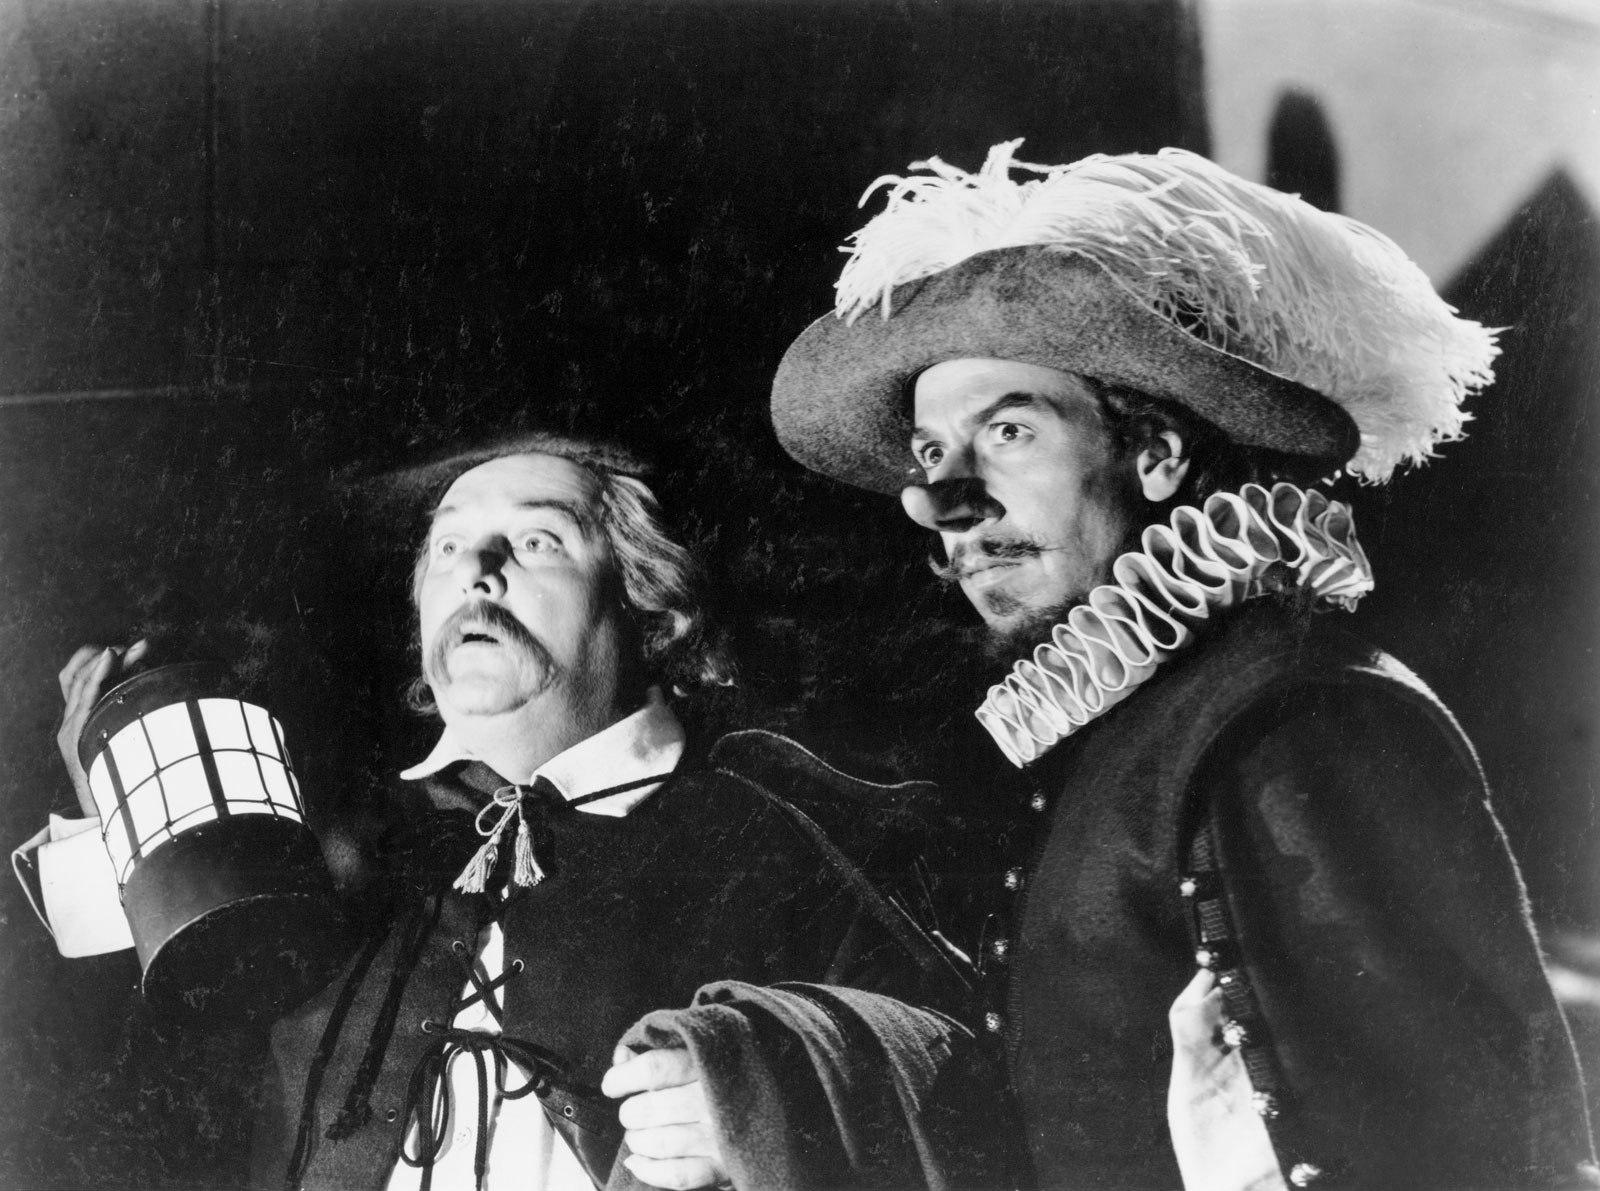 [critique] Cyrano De Bergerac (1950 – vost)